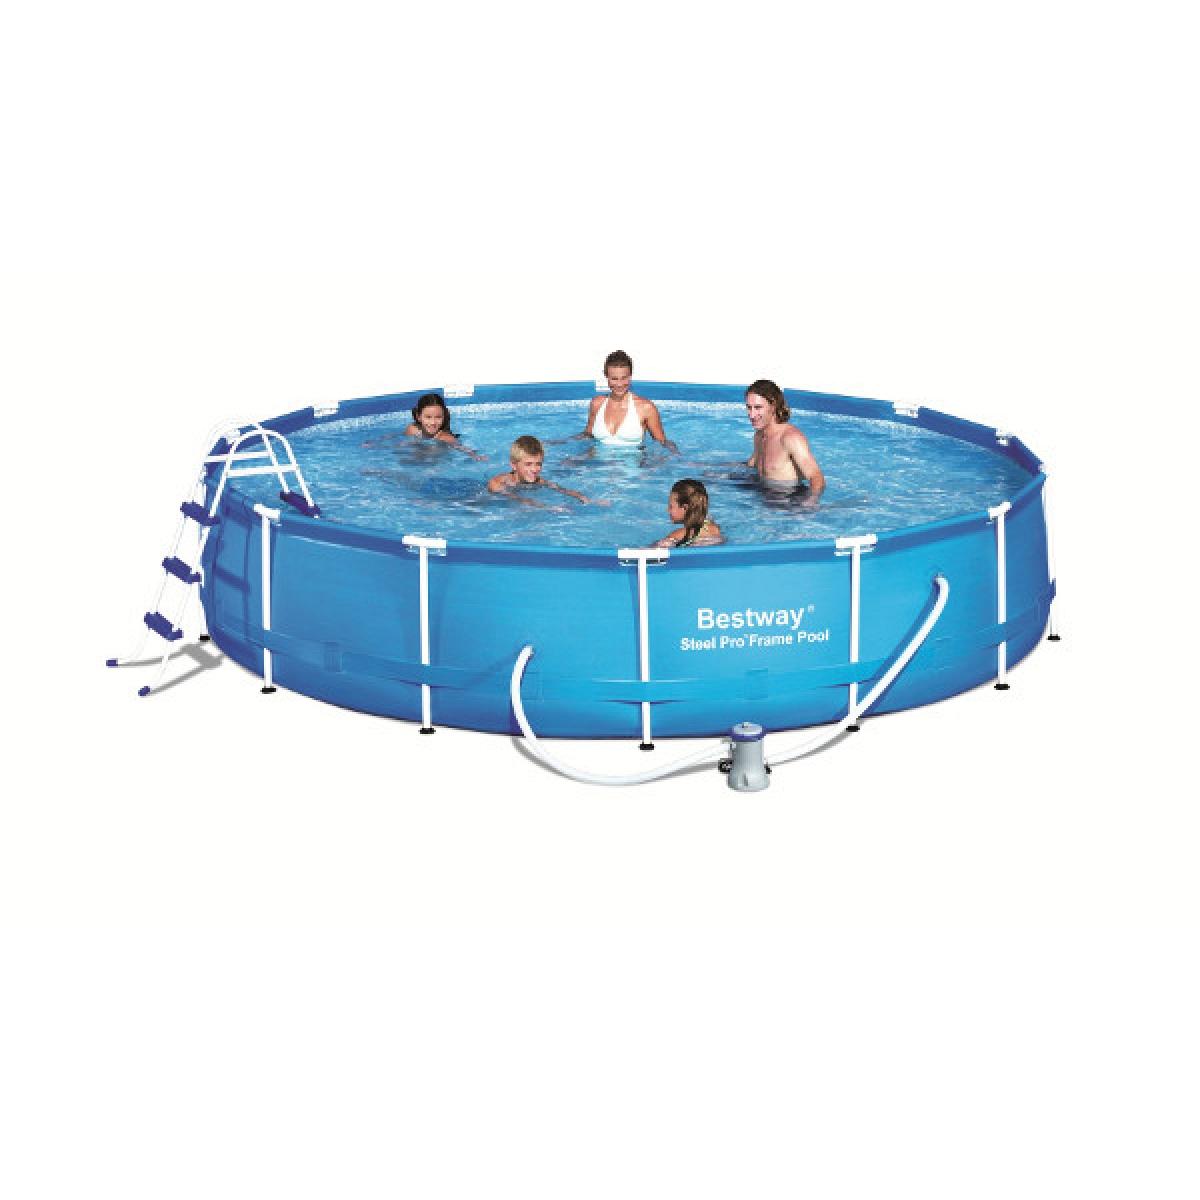 Piscina fuoriterra tonda bestway 457x91 mod steel pro - Filtri per piscine fuori terra ...